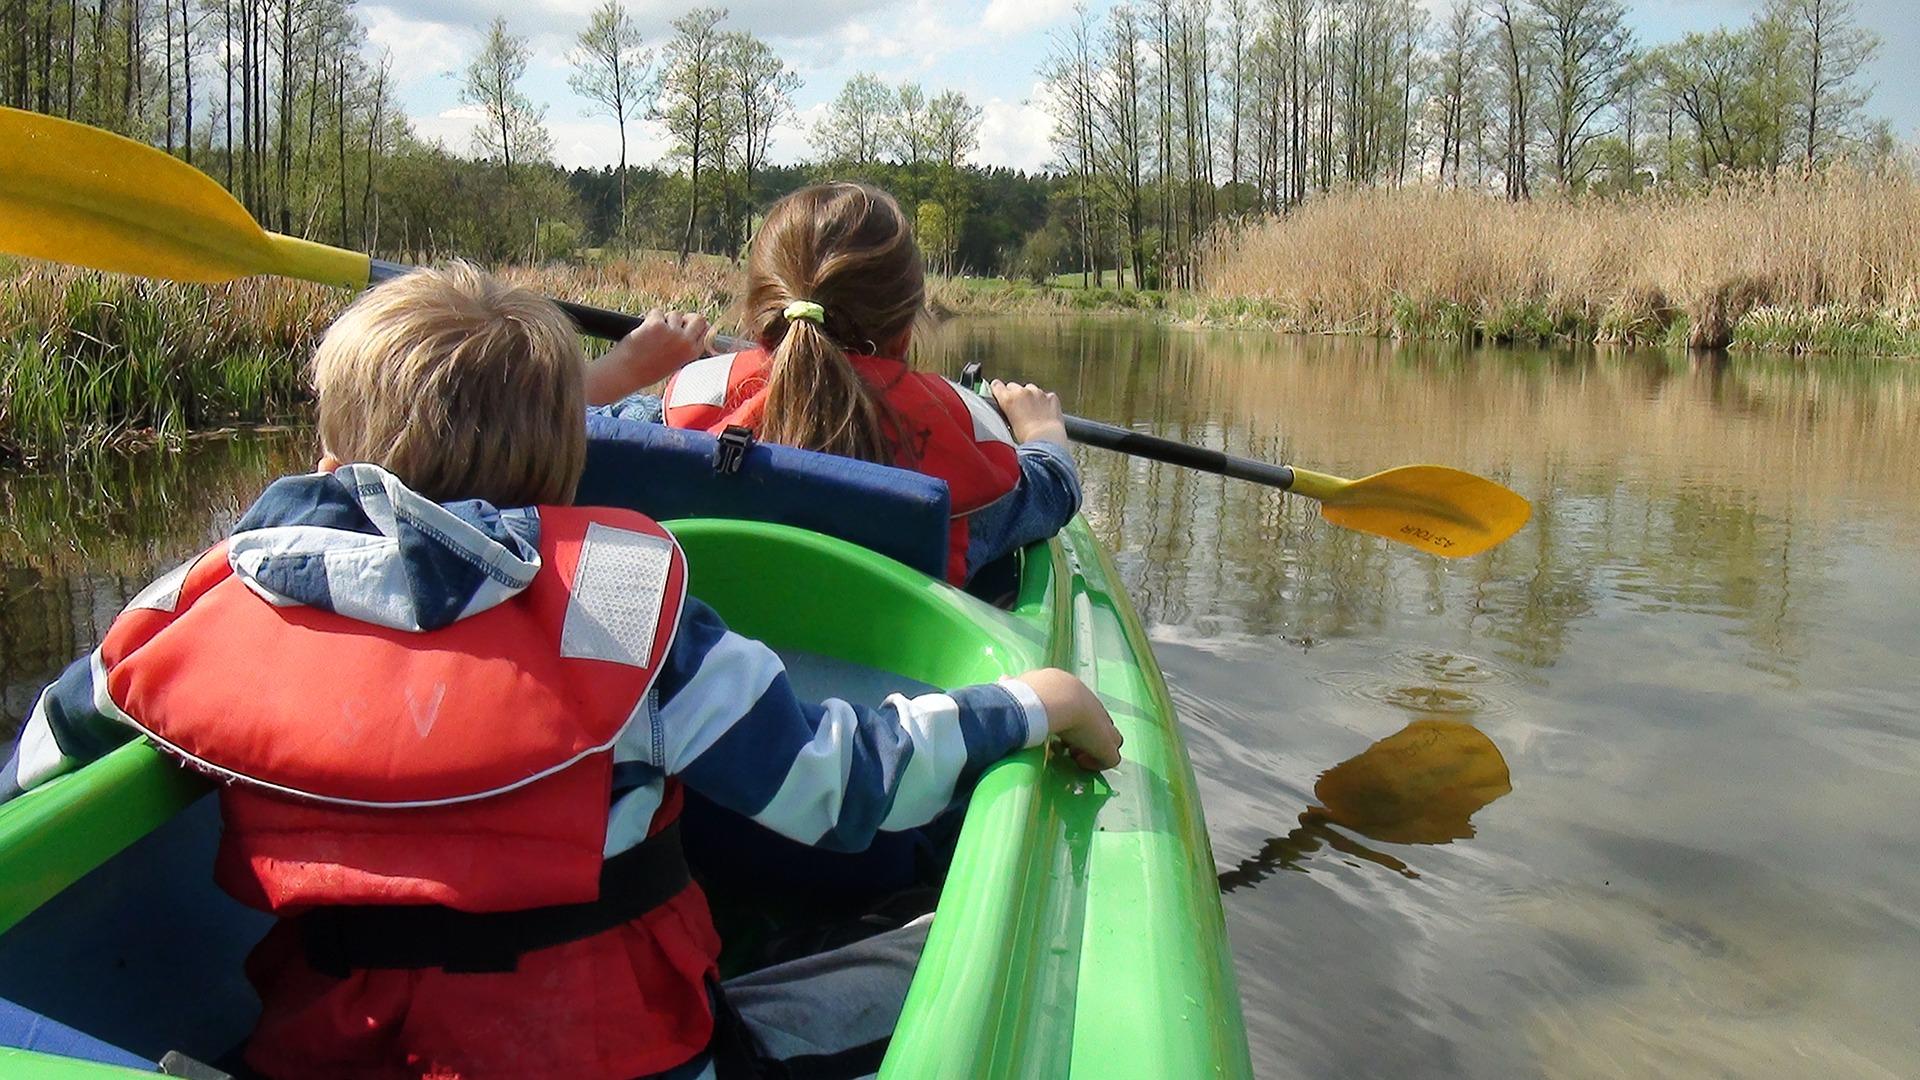 5 Fun Ways to Enjoy Nature Studies in June